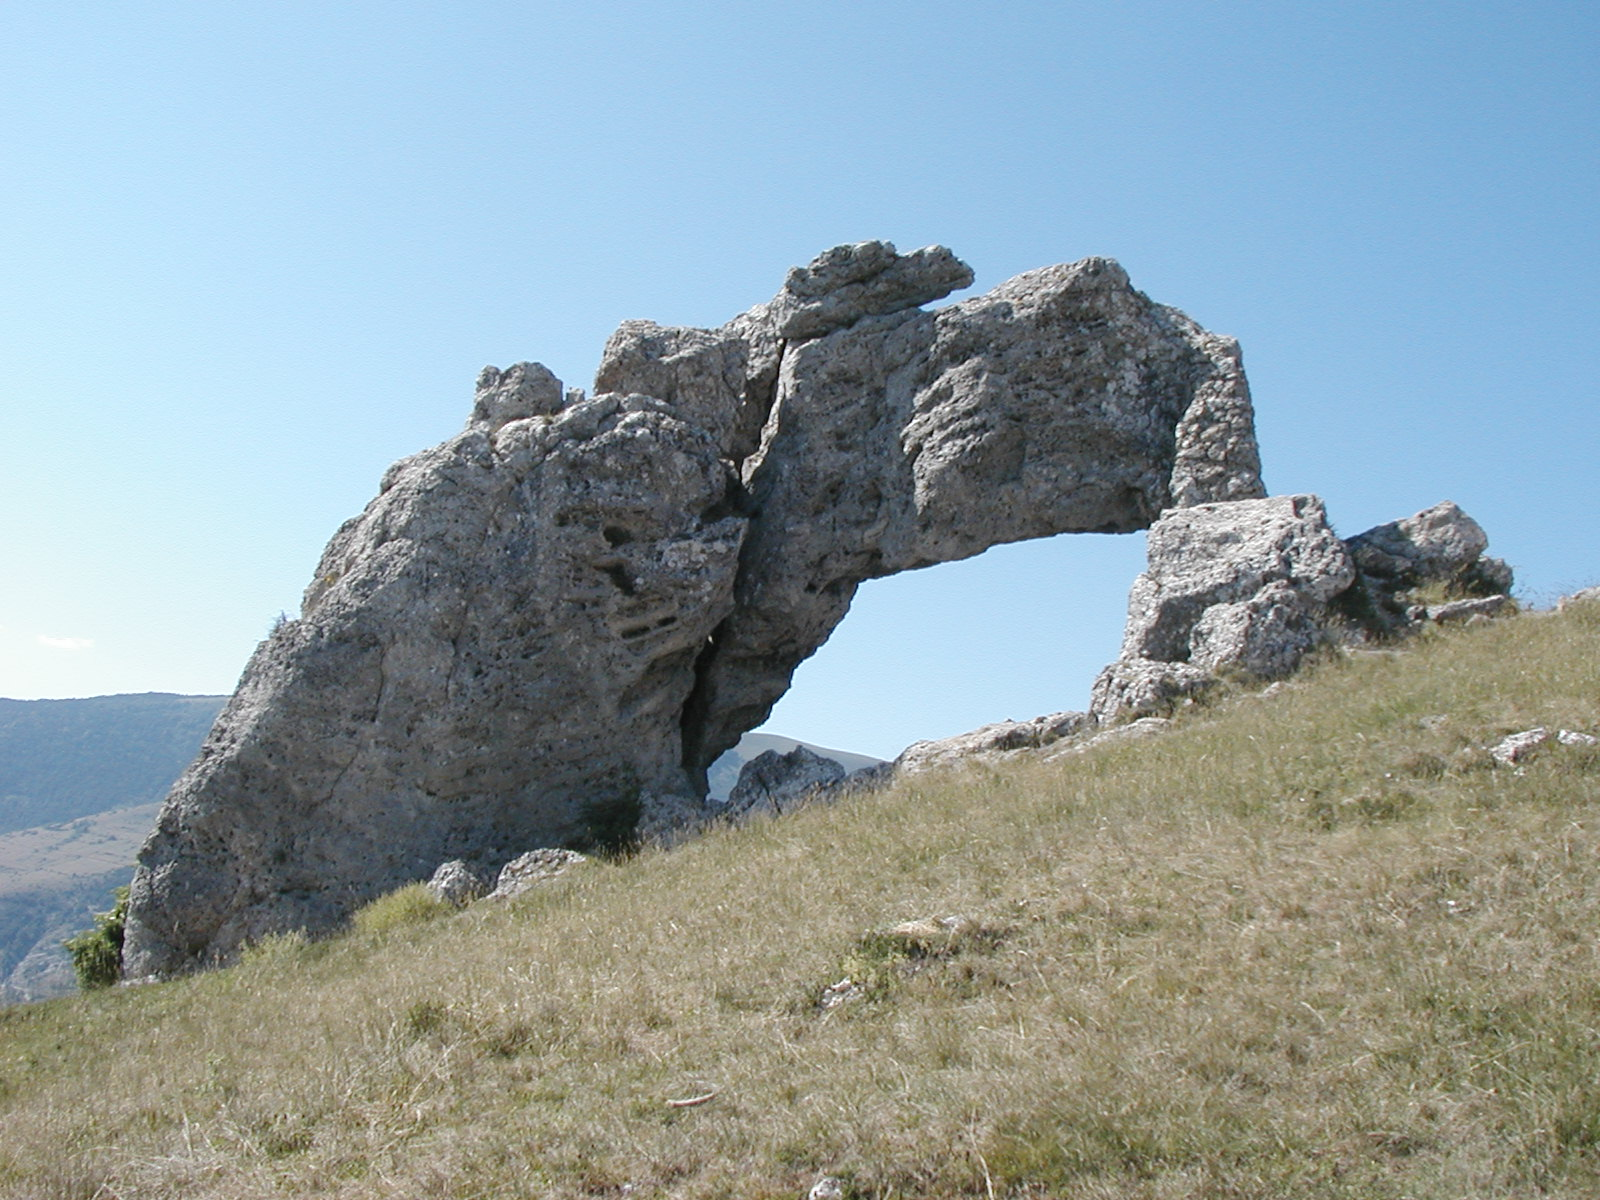 Les Croquis de Mélos (nature) La_Pierre_Perc%C3%A9e_(Dauphin%C3%A9)